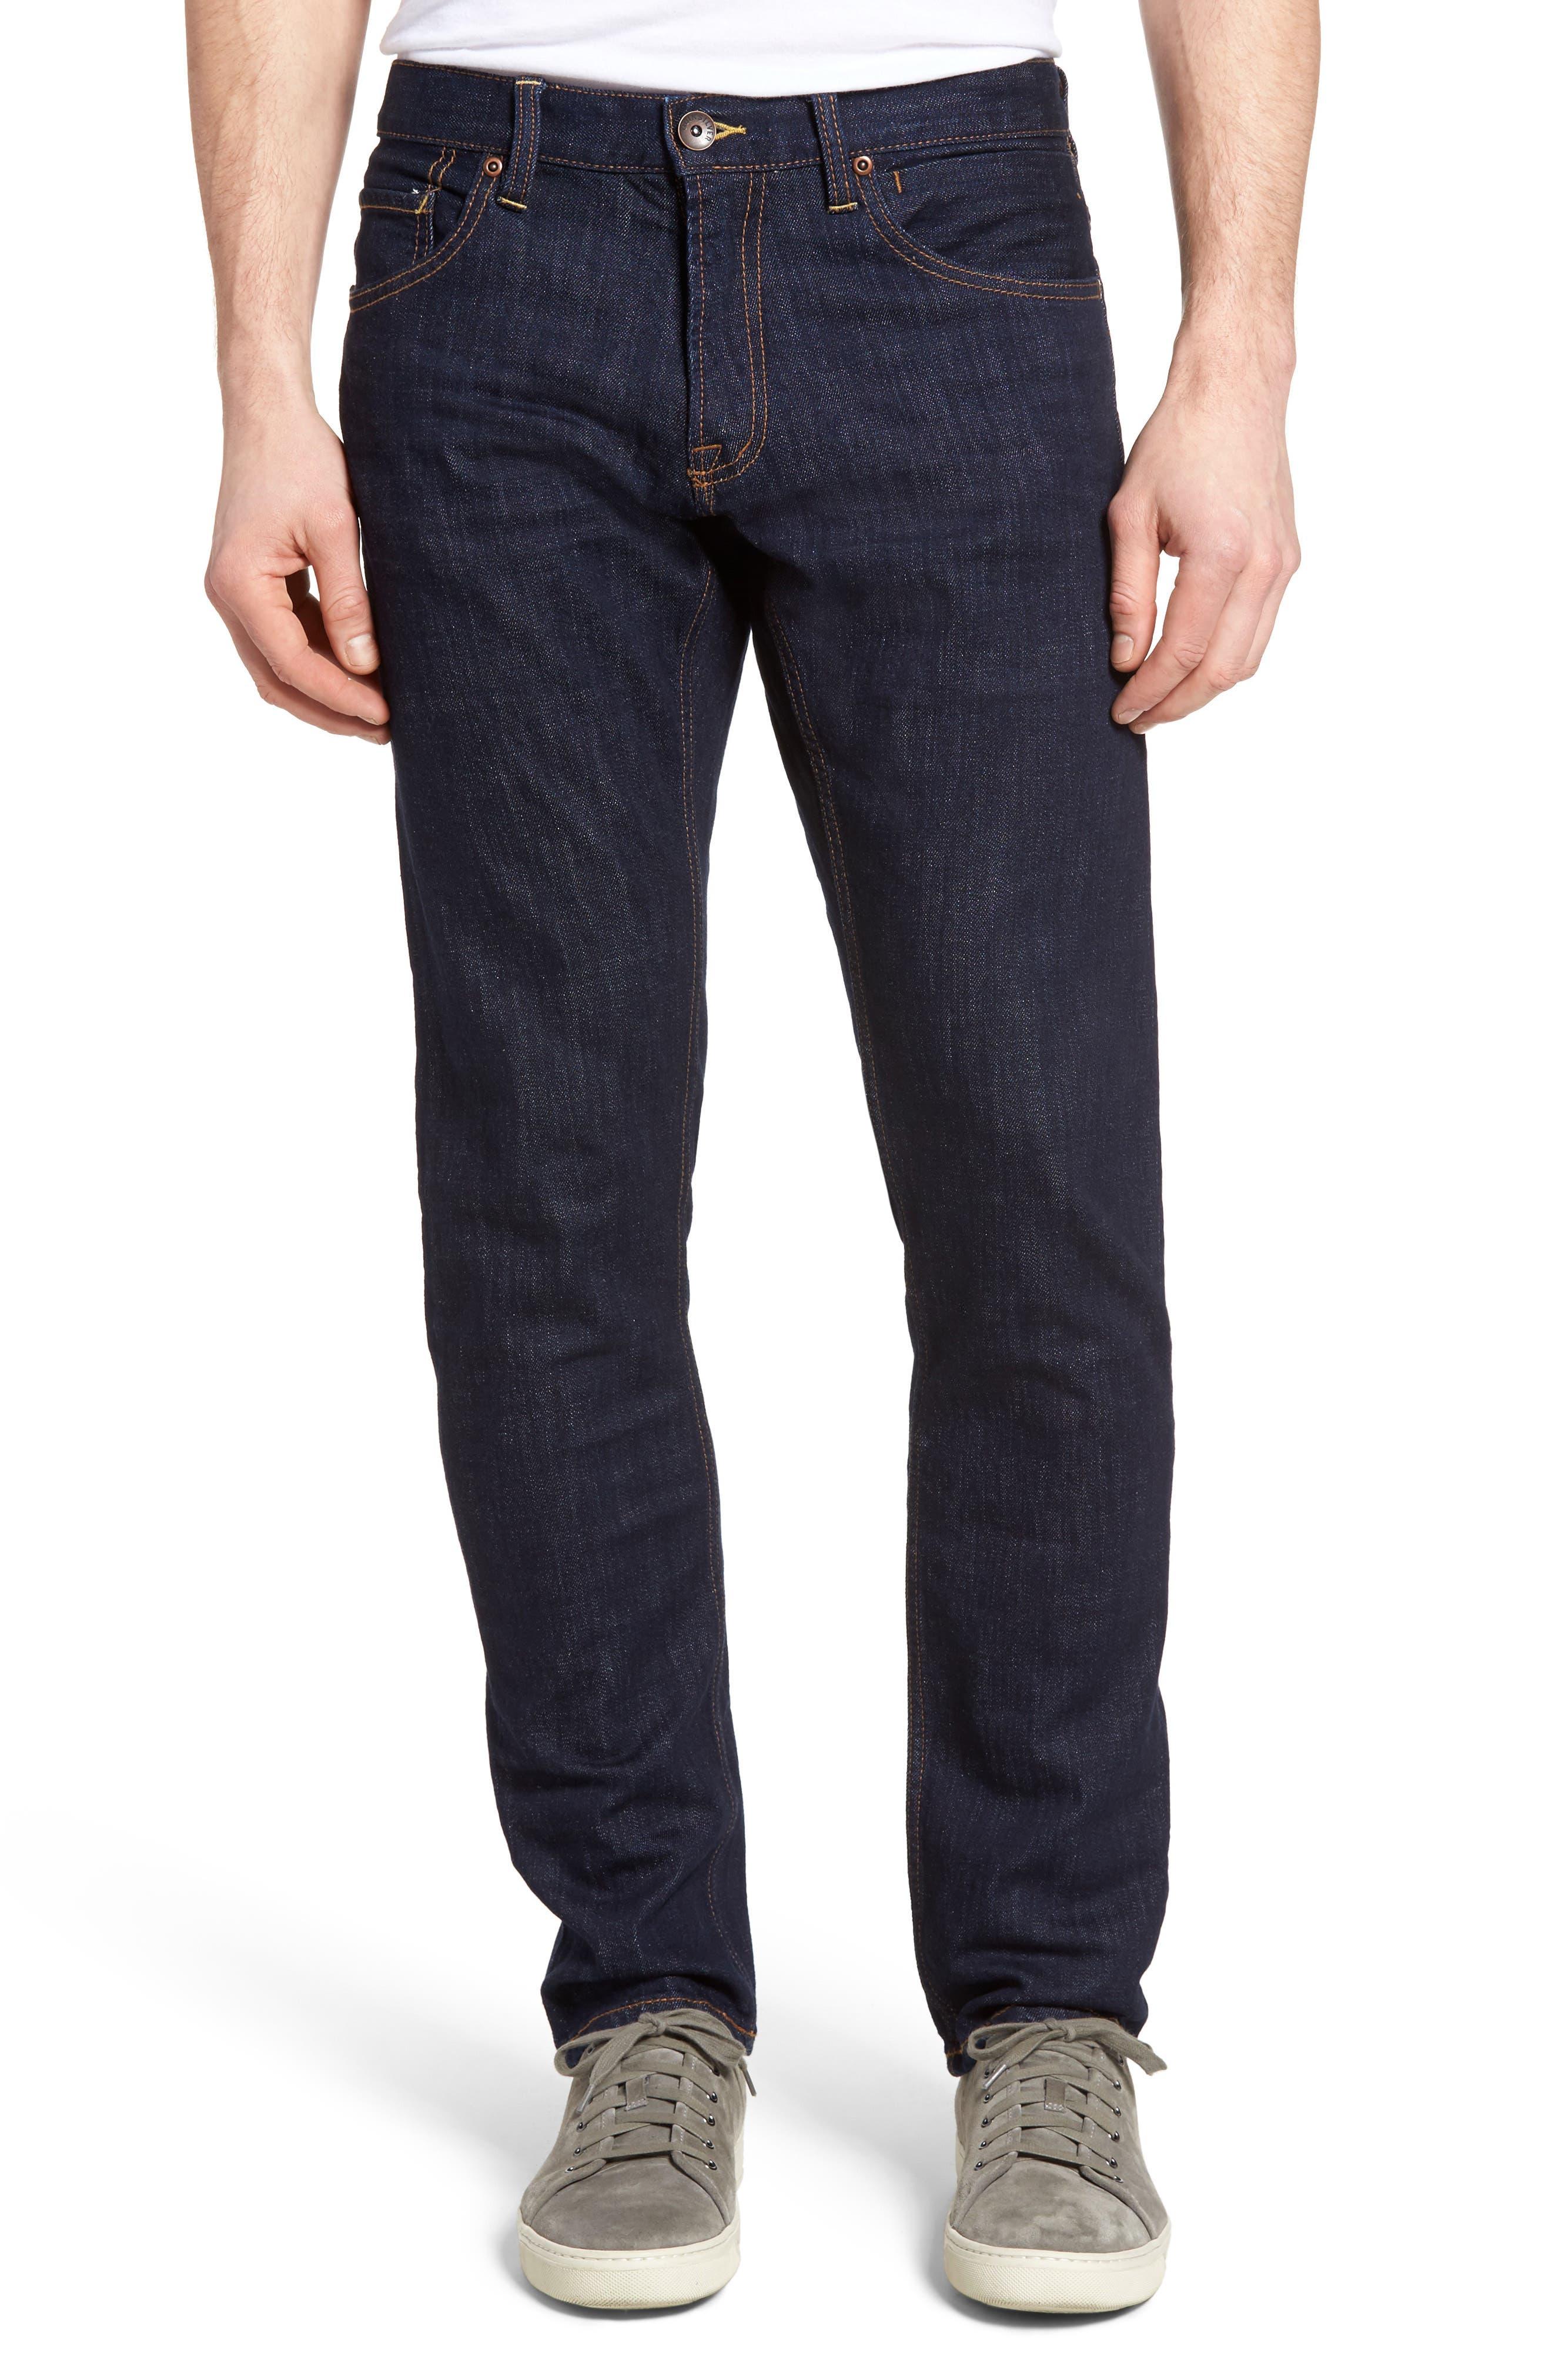 Revolver Slim Fit Jeans,                         Main,                         color, 401